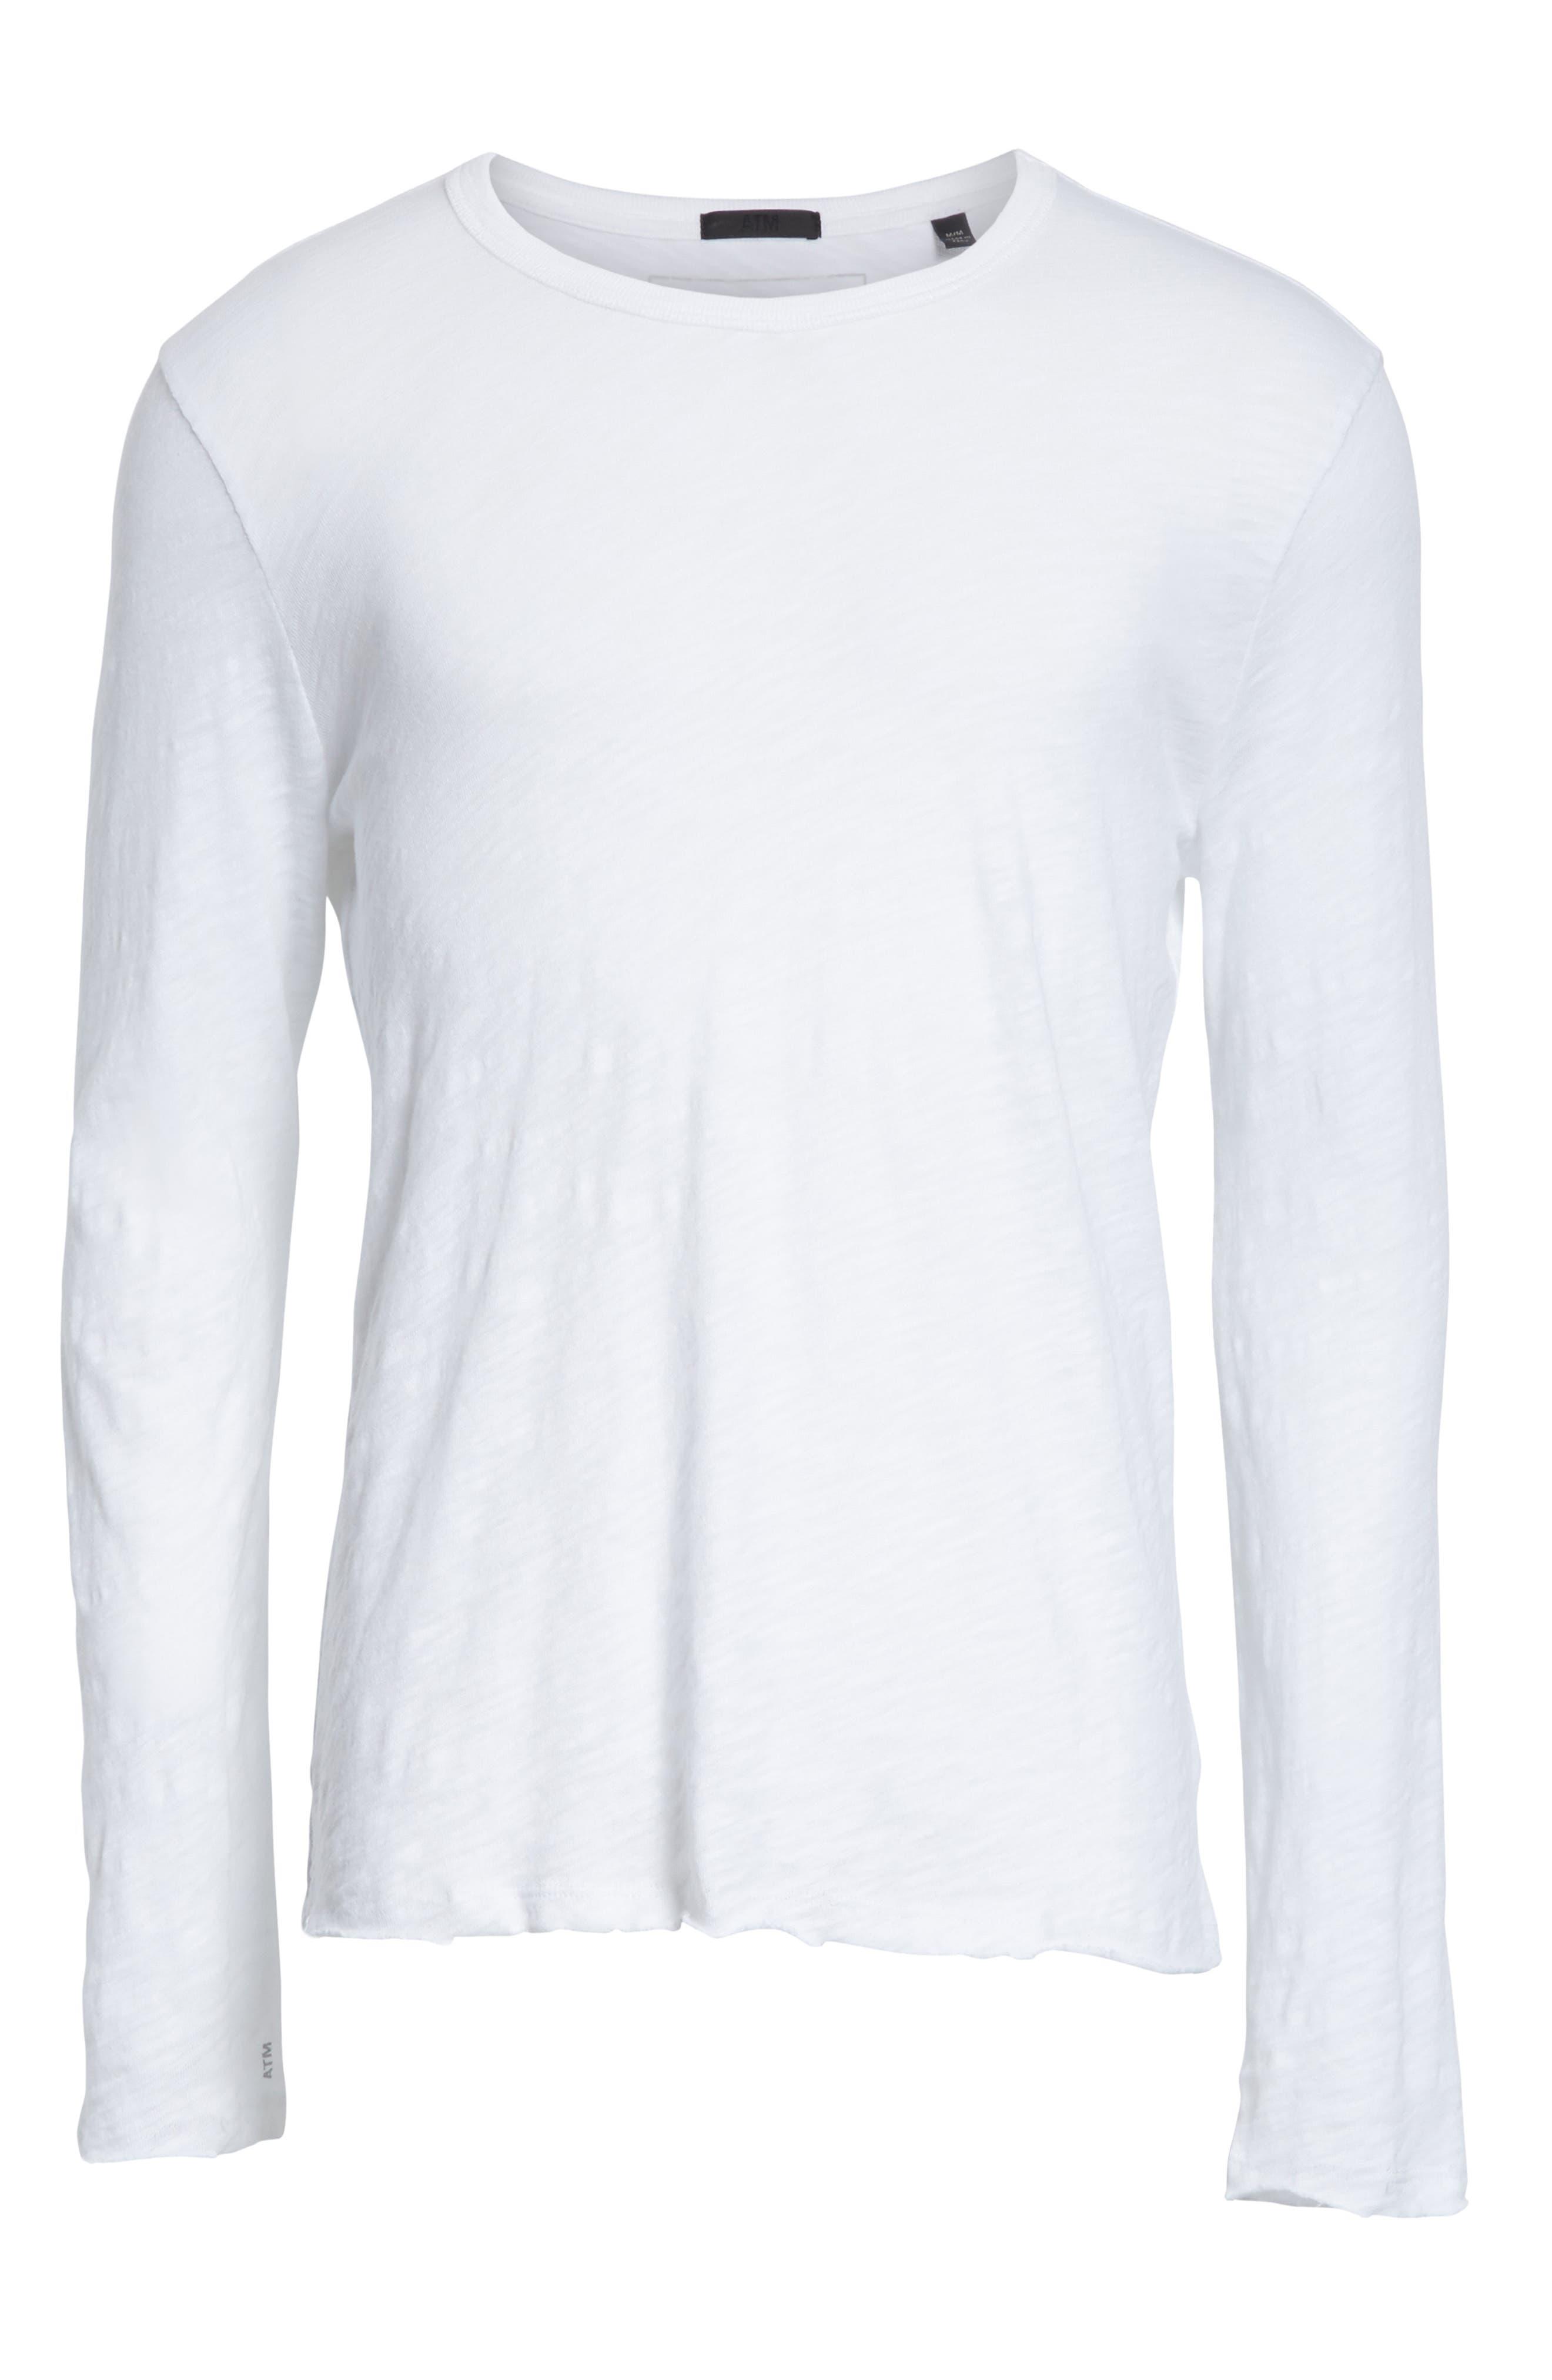 Destroyed Long Sleeve T-Shirt,                             Alternate thumbnail 6, color,                             White